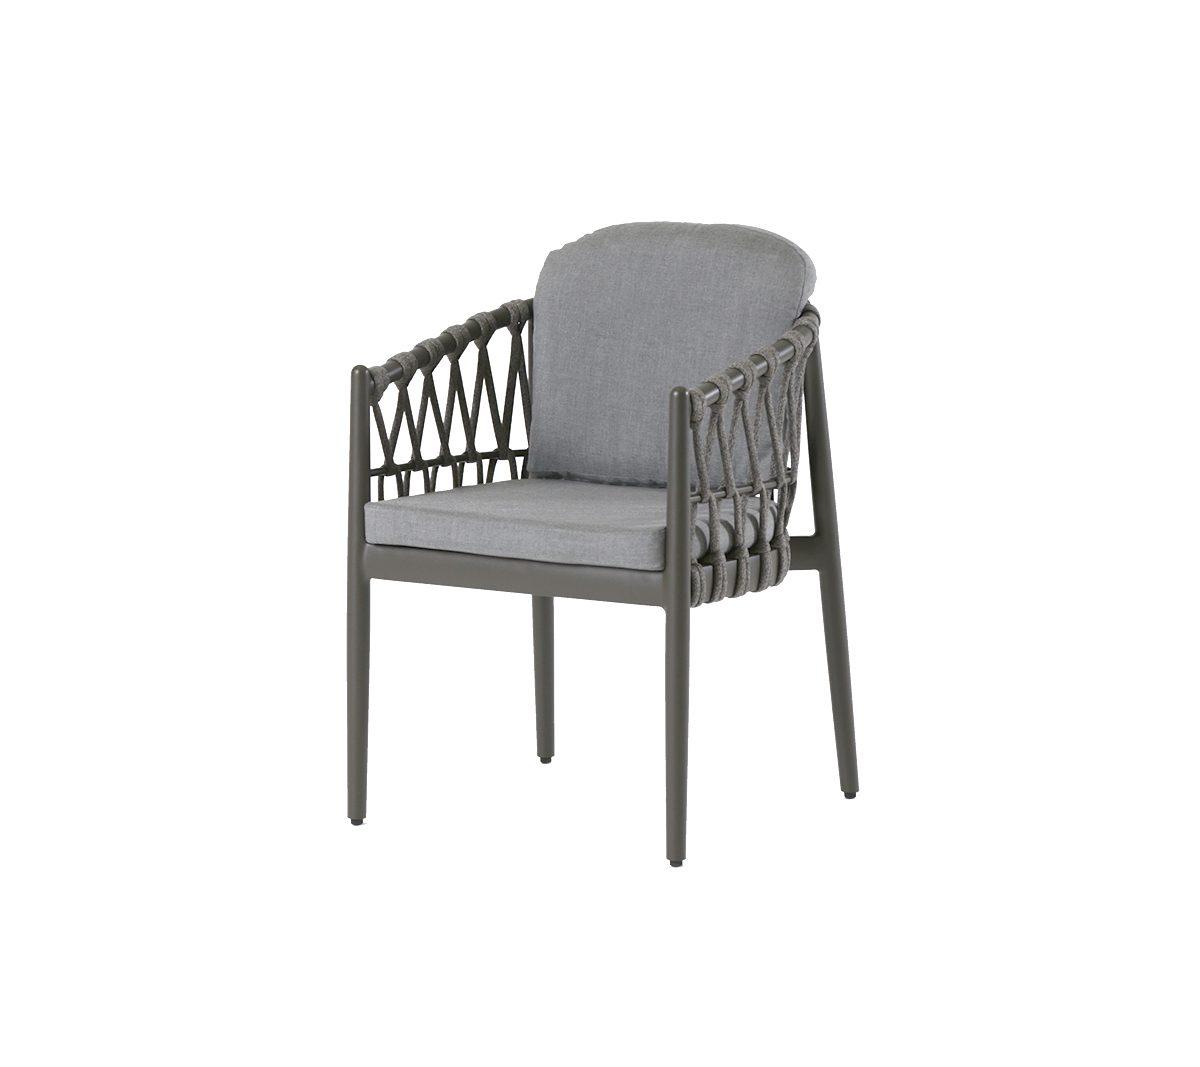 Lamego-Dining-Arm-Chair-wCushion-1200x1067